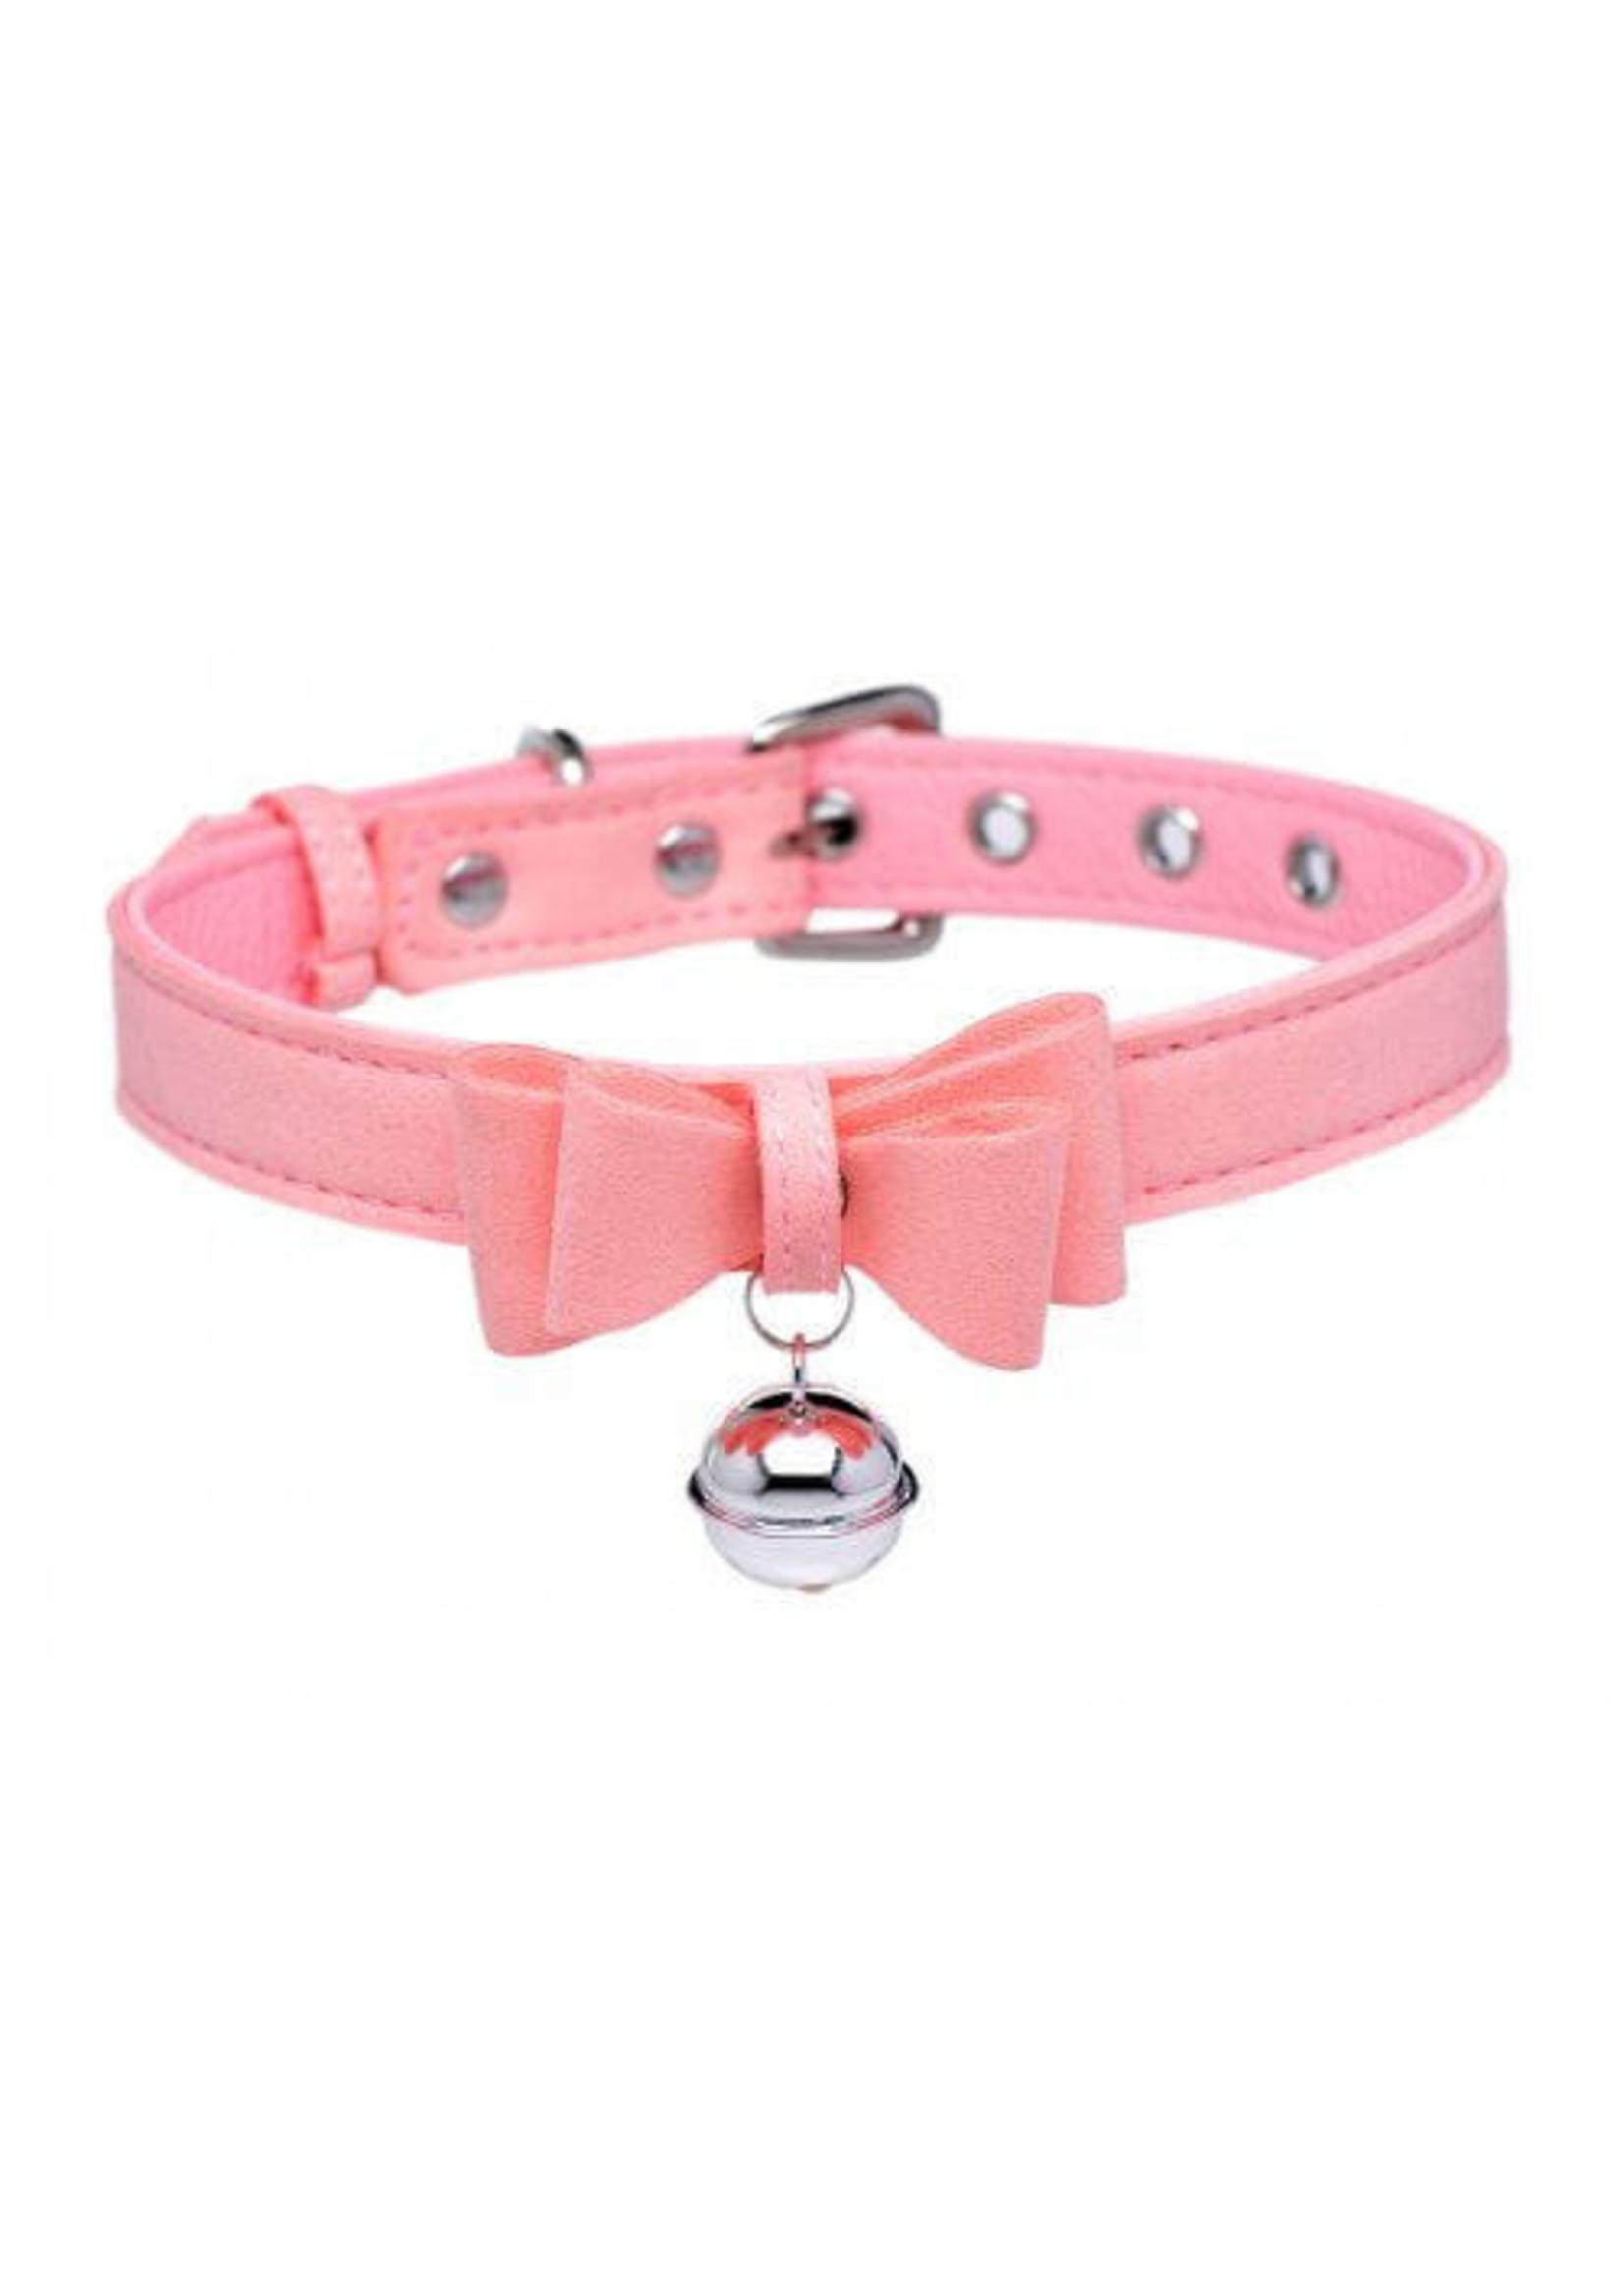 Sugar Kitty Cat Bell Collar - Pink/Silver